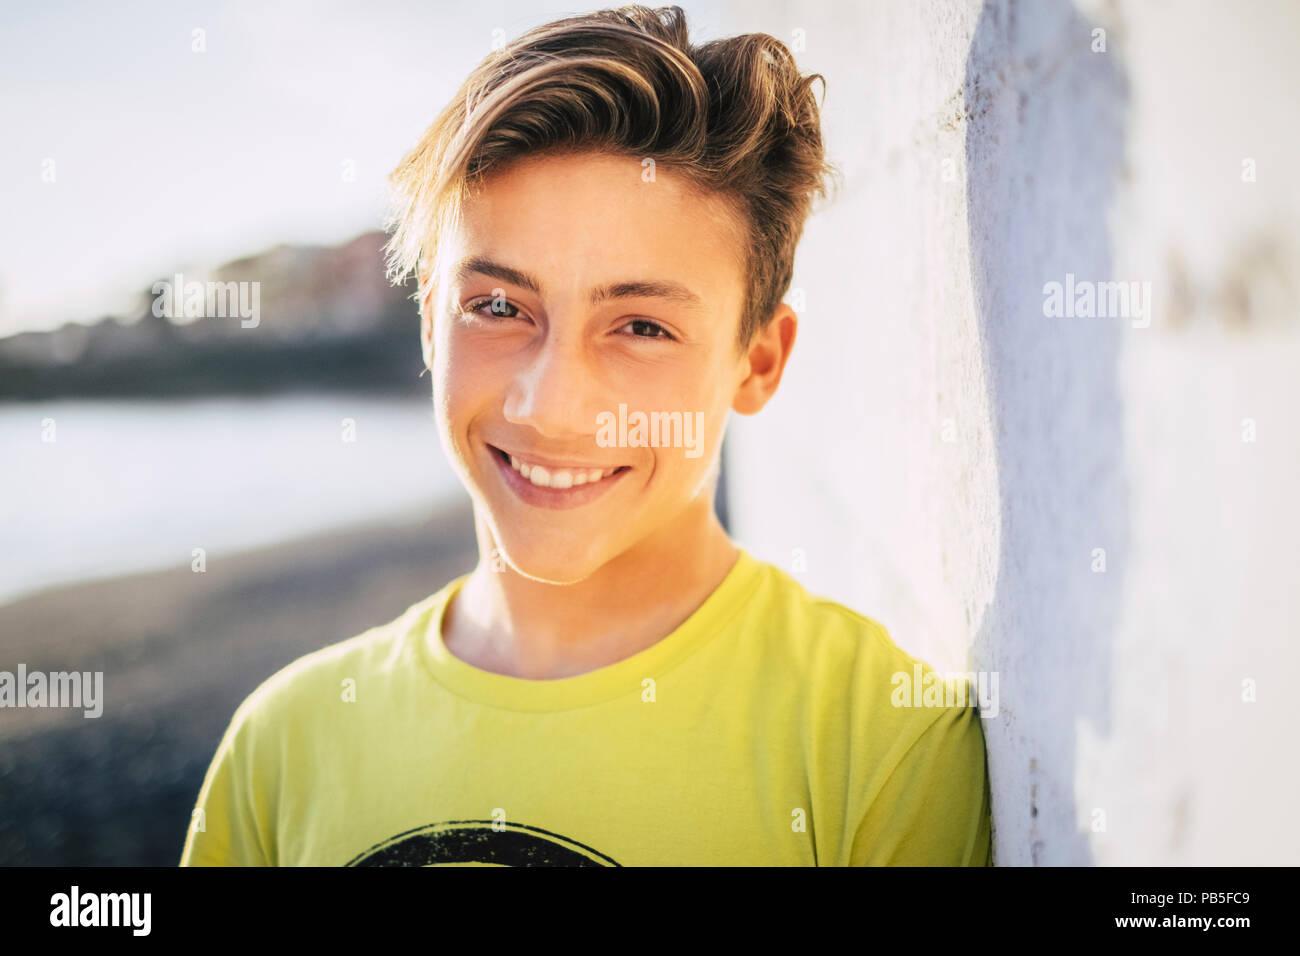 Hermosa joven adolescente masculino sonrisa exterior con un fondo de cielo azul imagen concepto estilo veraniego. Imagen De Stock